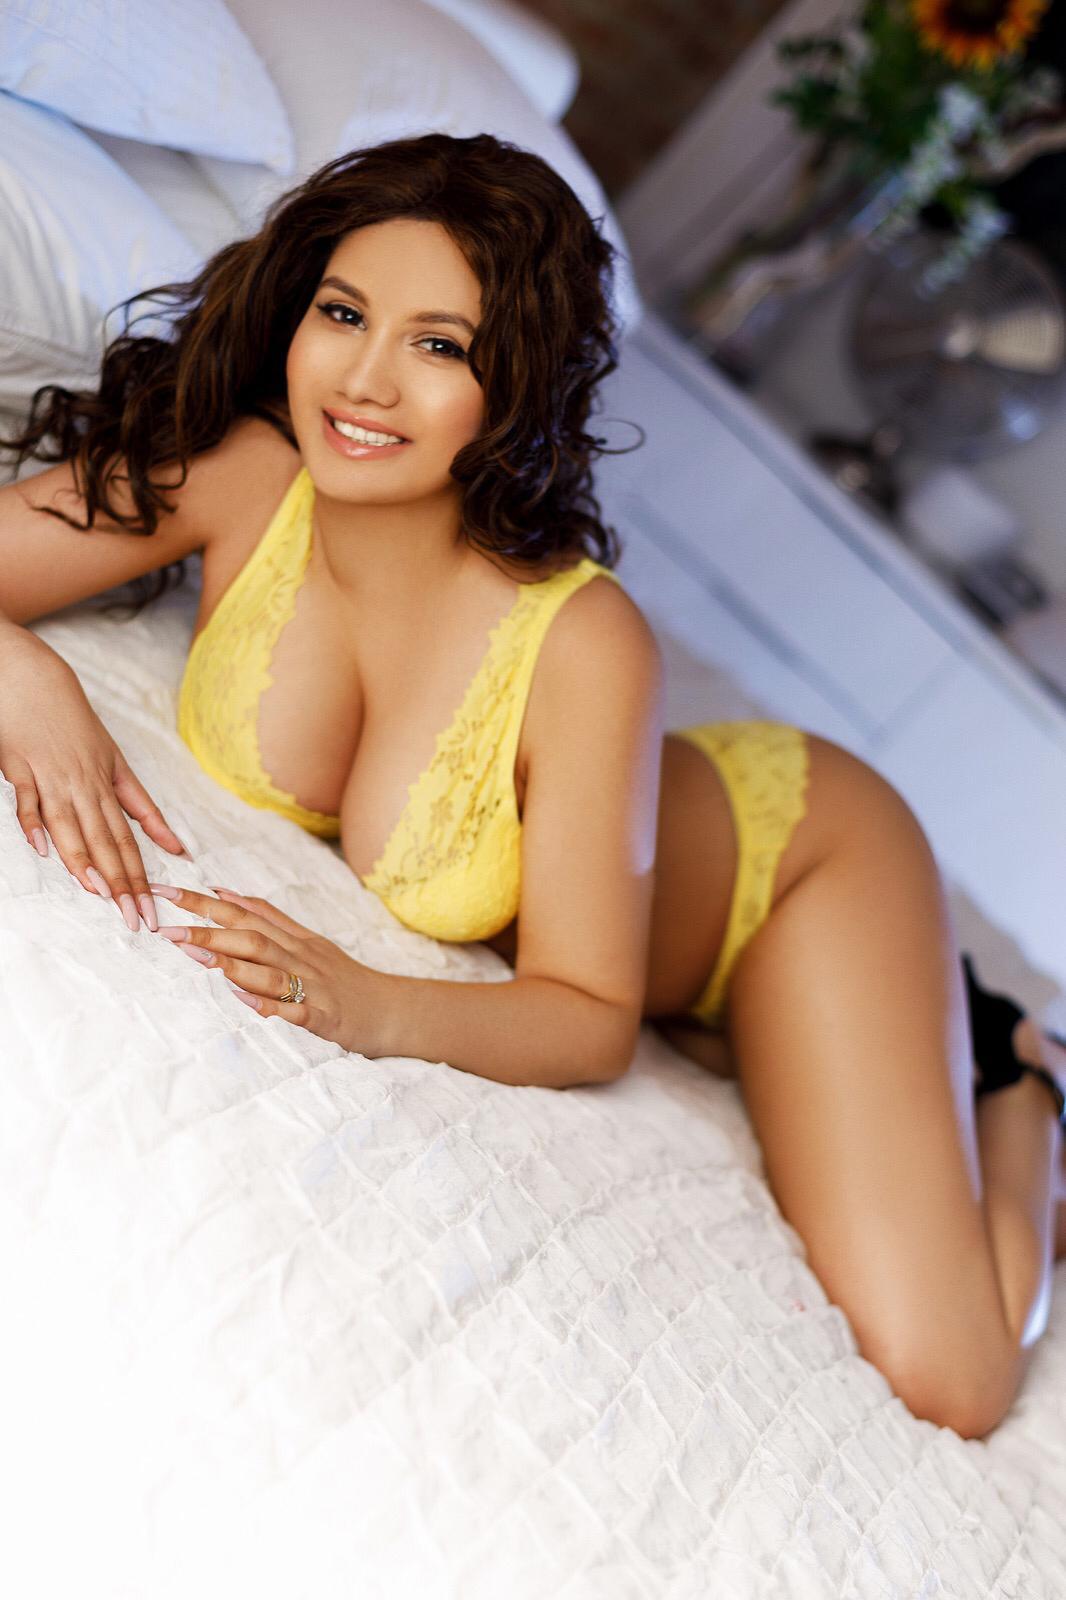 Amira Escort